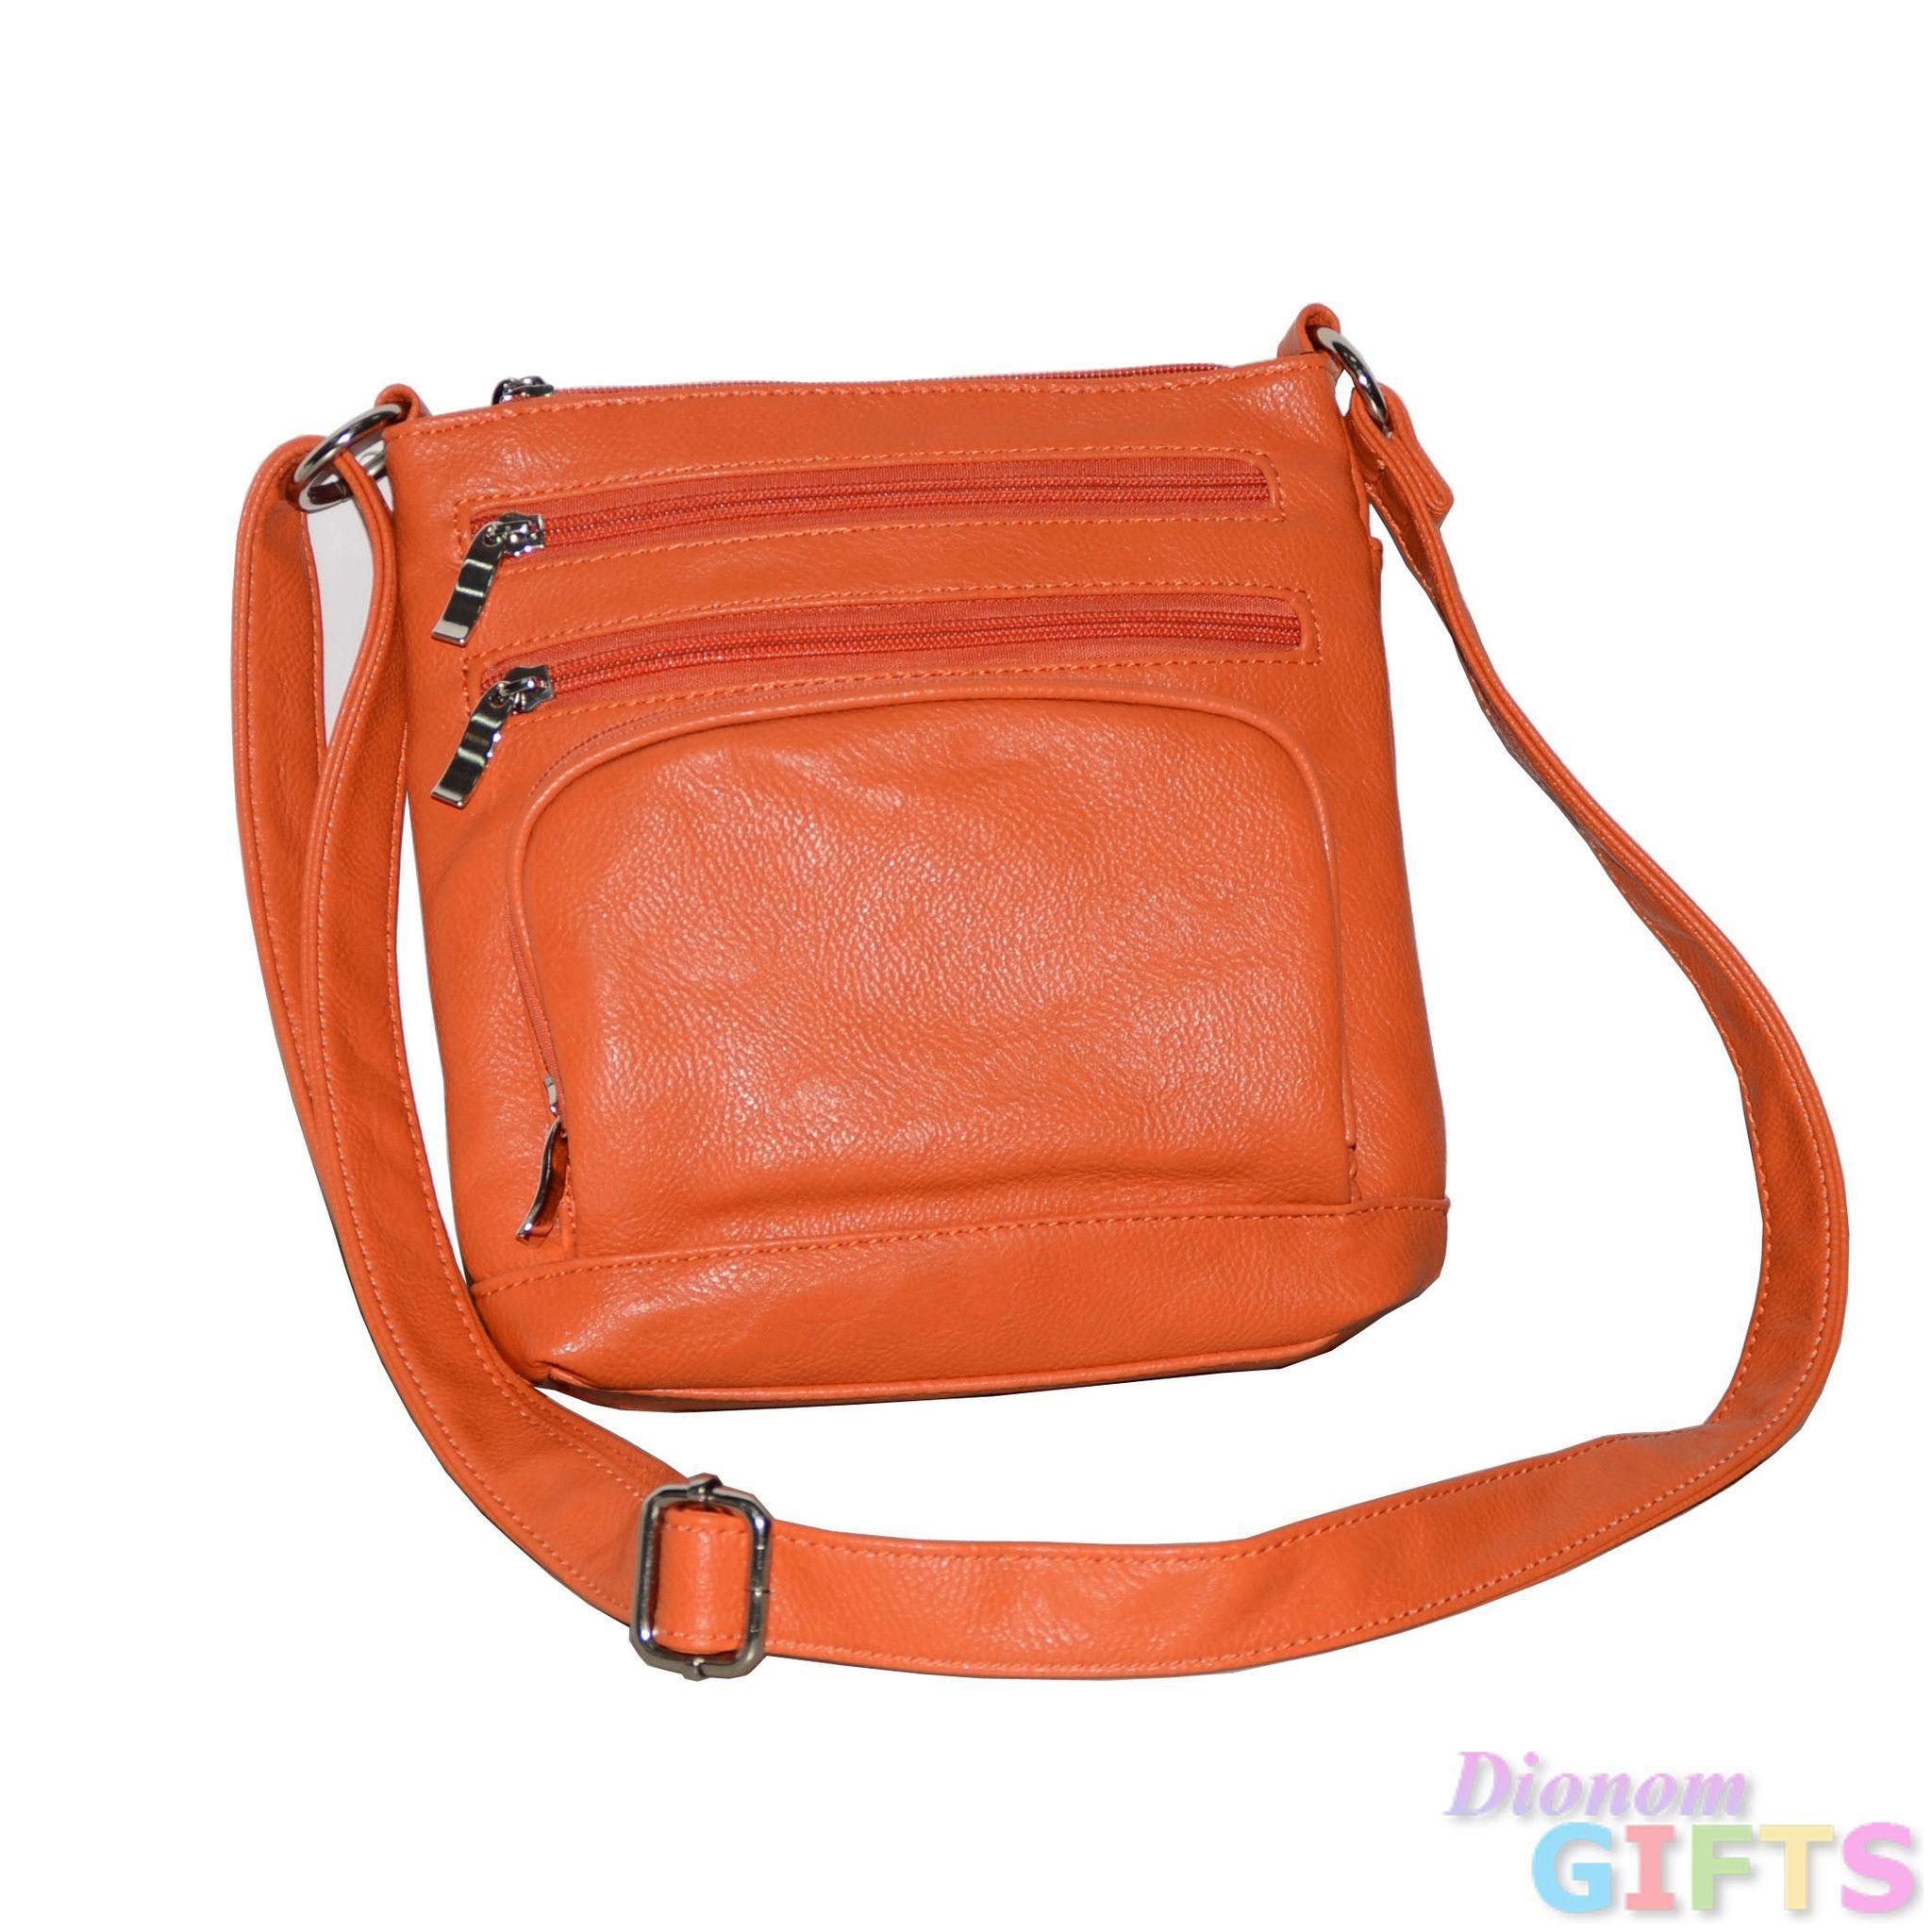 Silver metallic flap clutch handbags collection pinterest